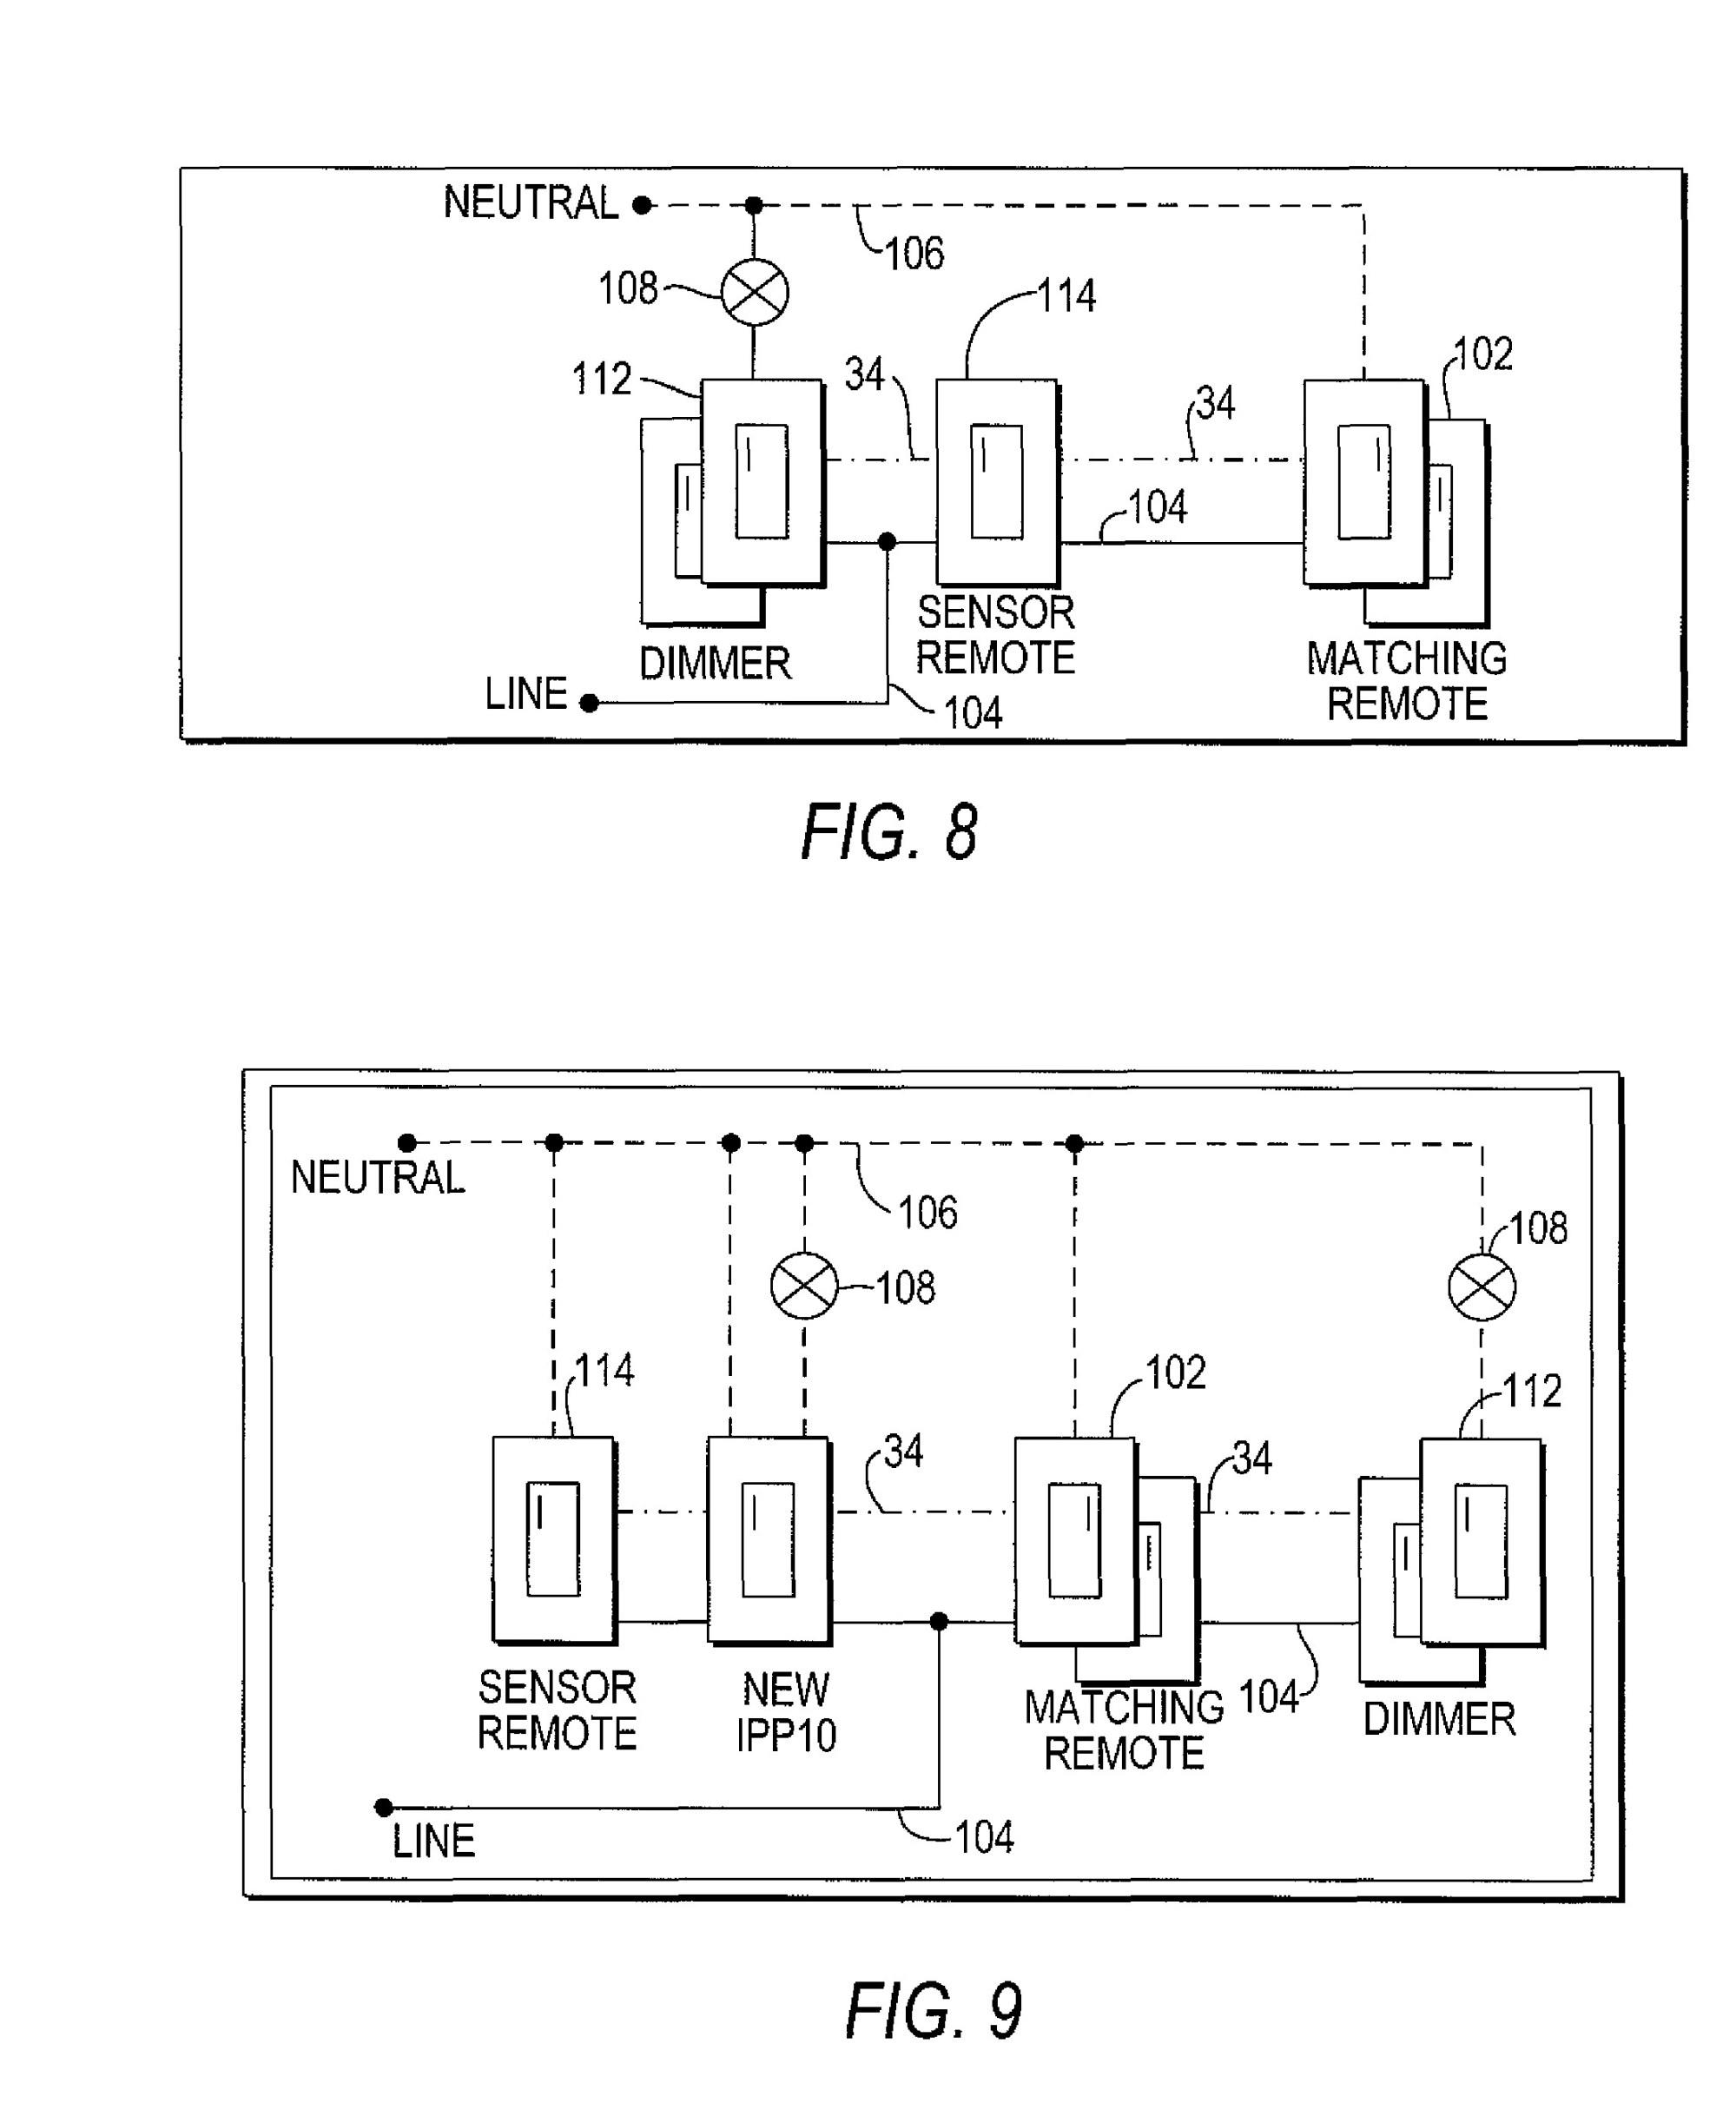 hight resolution of lutron maestro wiring diagram wiring diagram site lutron 4 way diagram